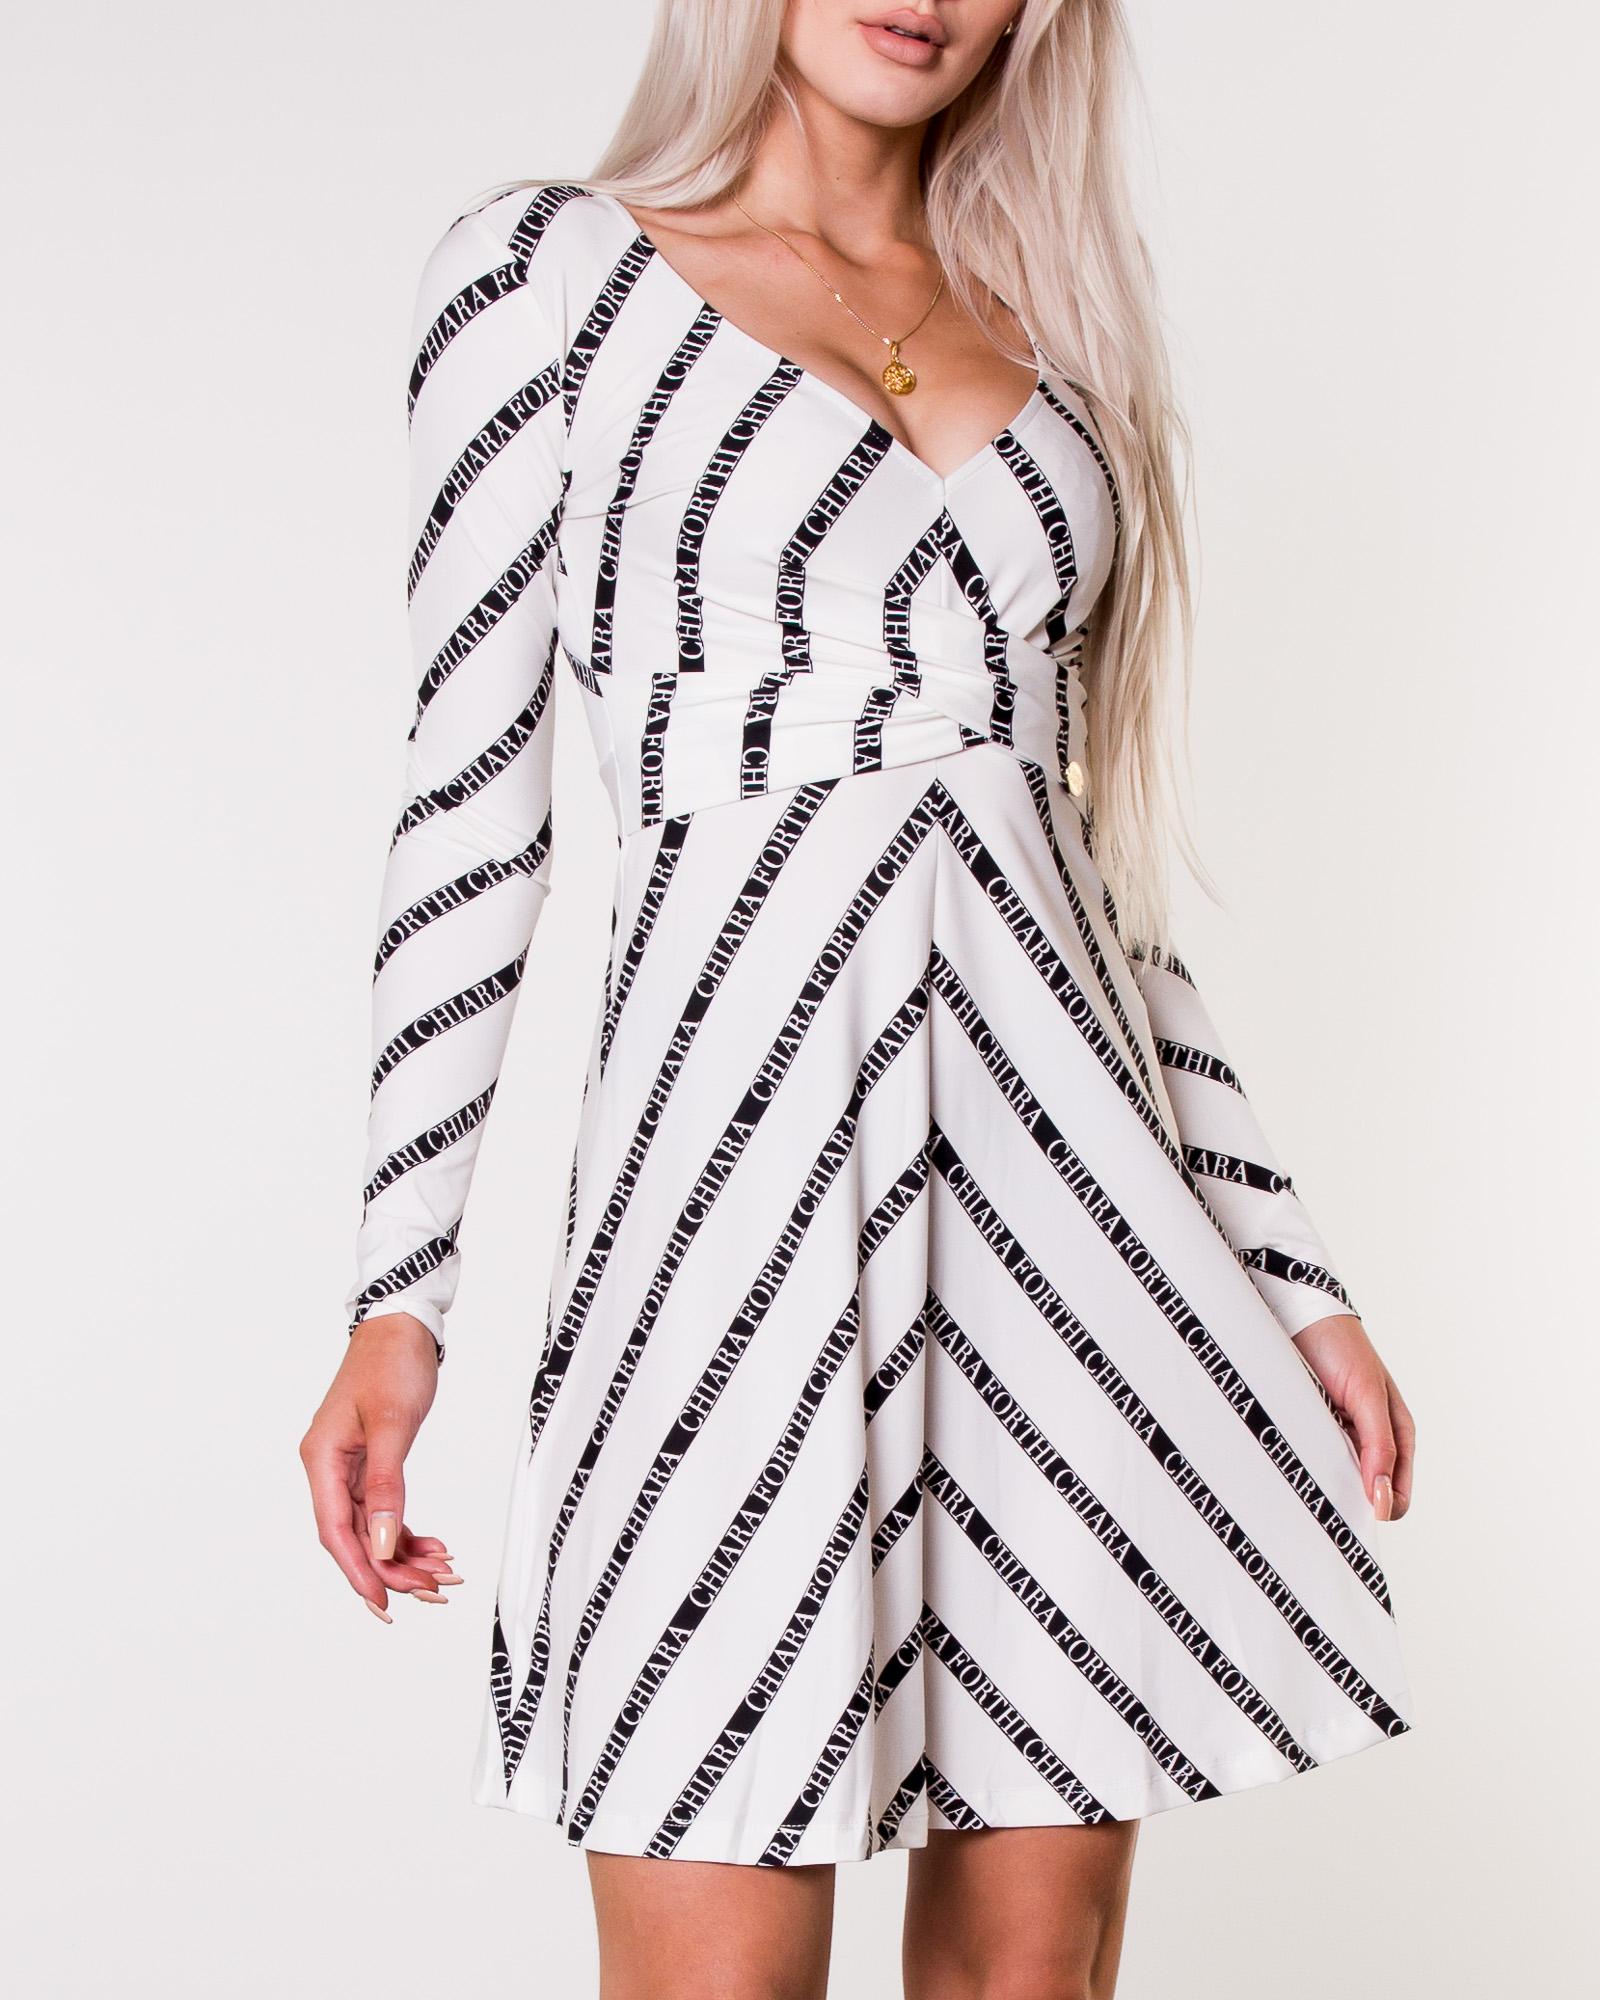 5d4da9c3 Chiara Forthi, Madaloni Dress White/Black   Women's Dresses    HOUSEOFBRANDON.COM